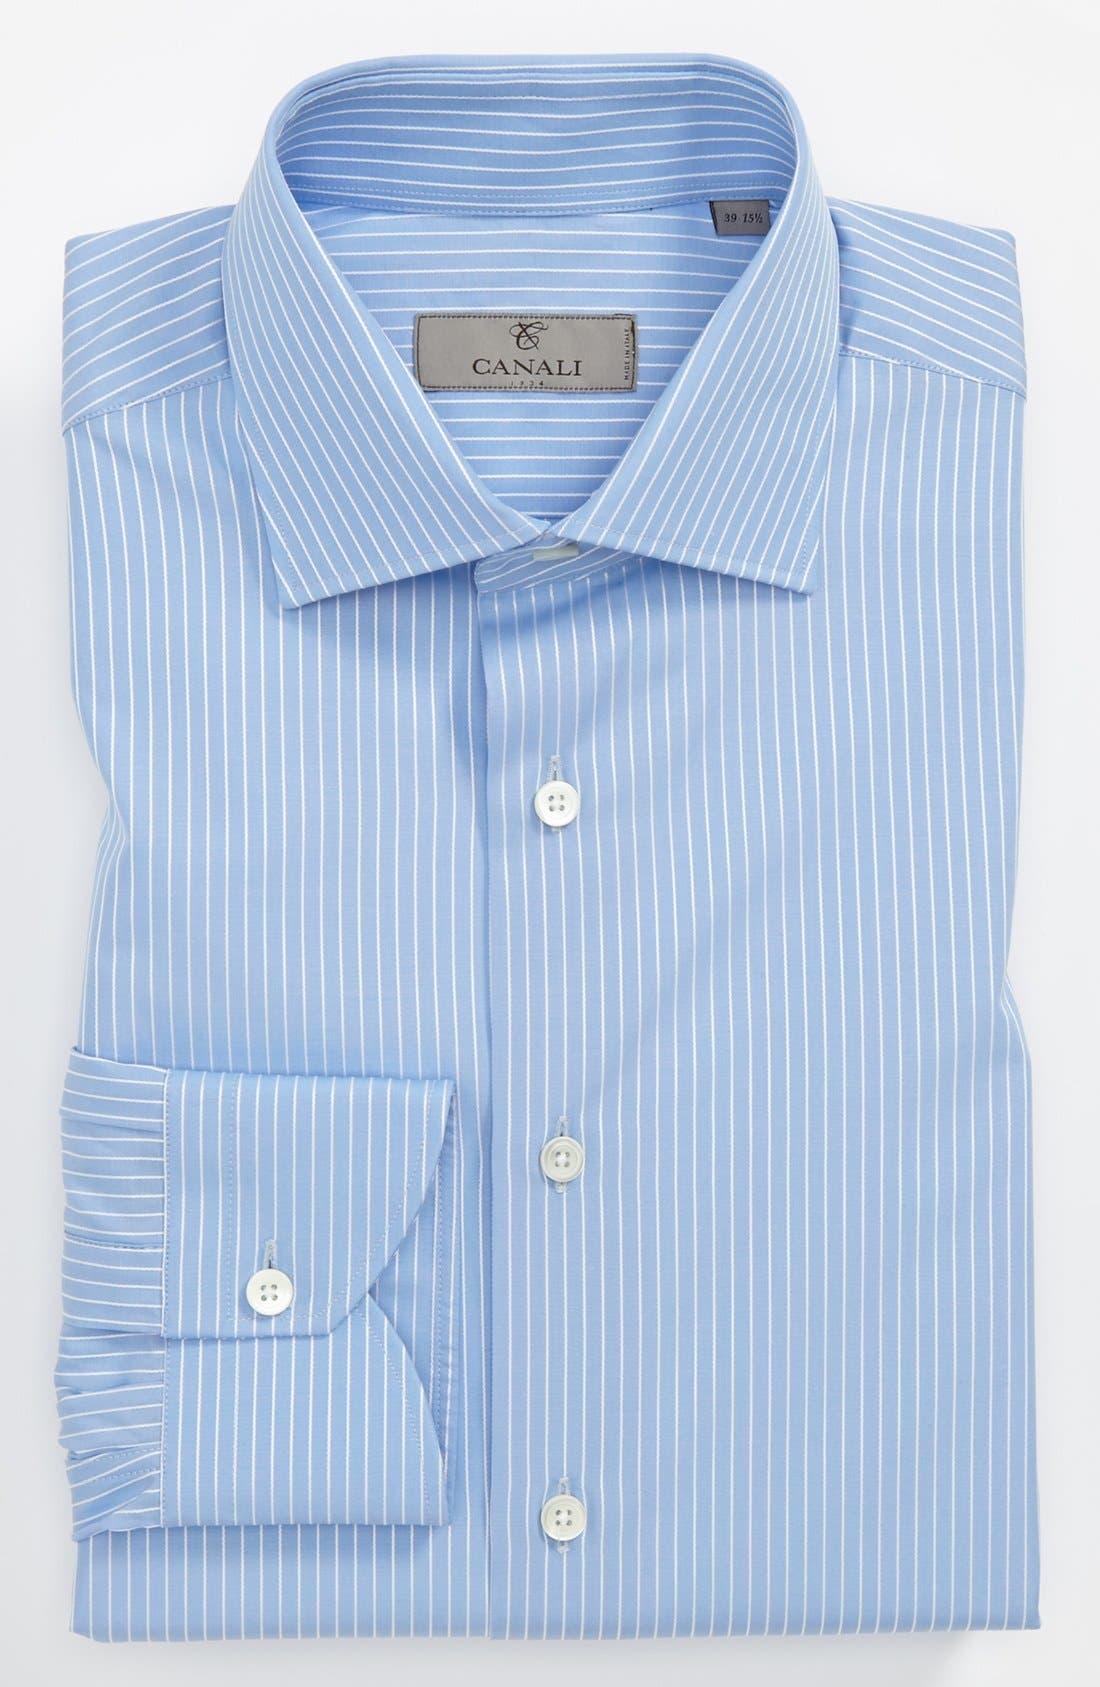 CANALI Regular Fit Dress Shirt, Main, color, 400